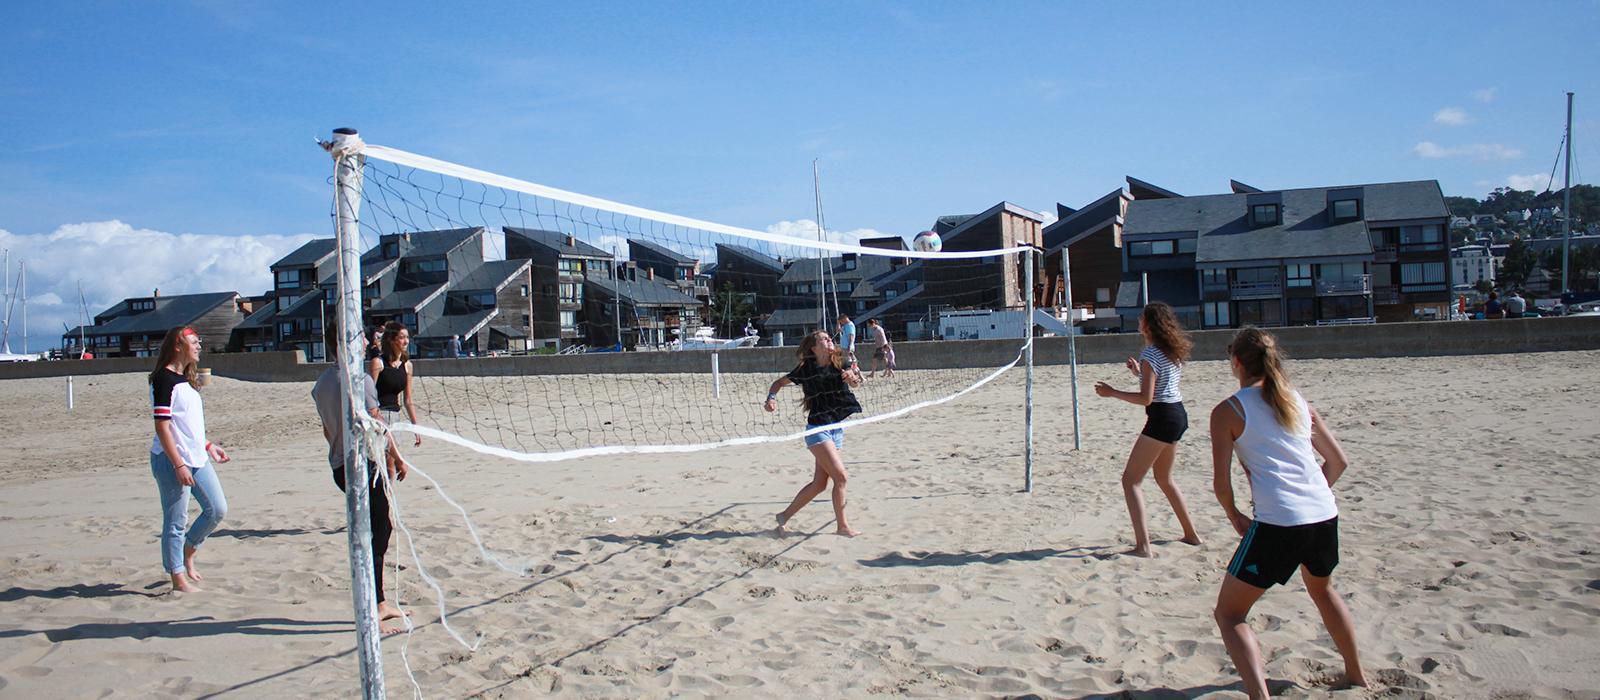 Beach volleyball on Deauville beach